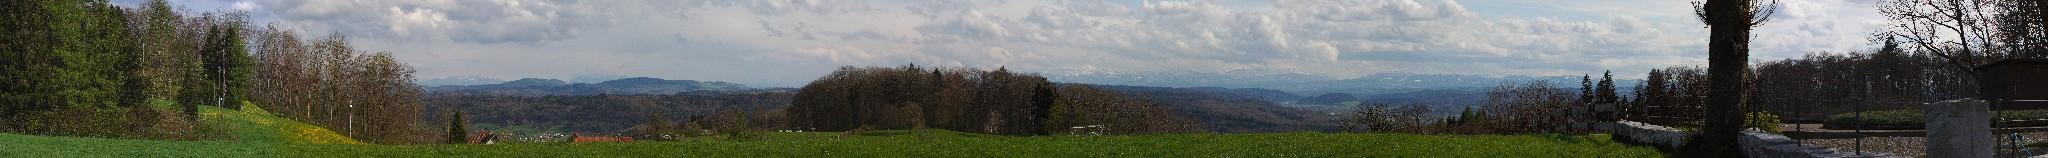 Photo: View from Engelberg, Walterswil, Switzerland